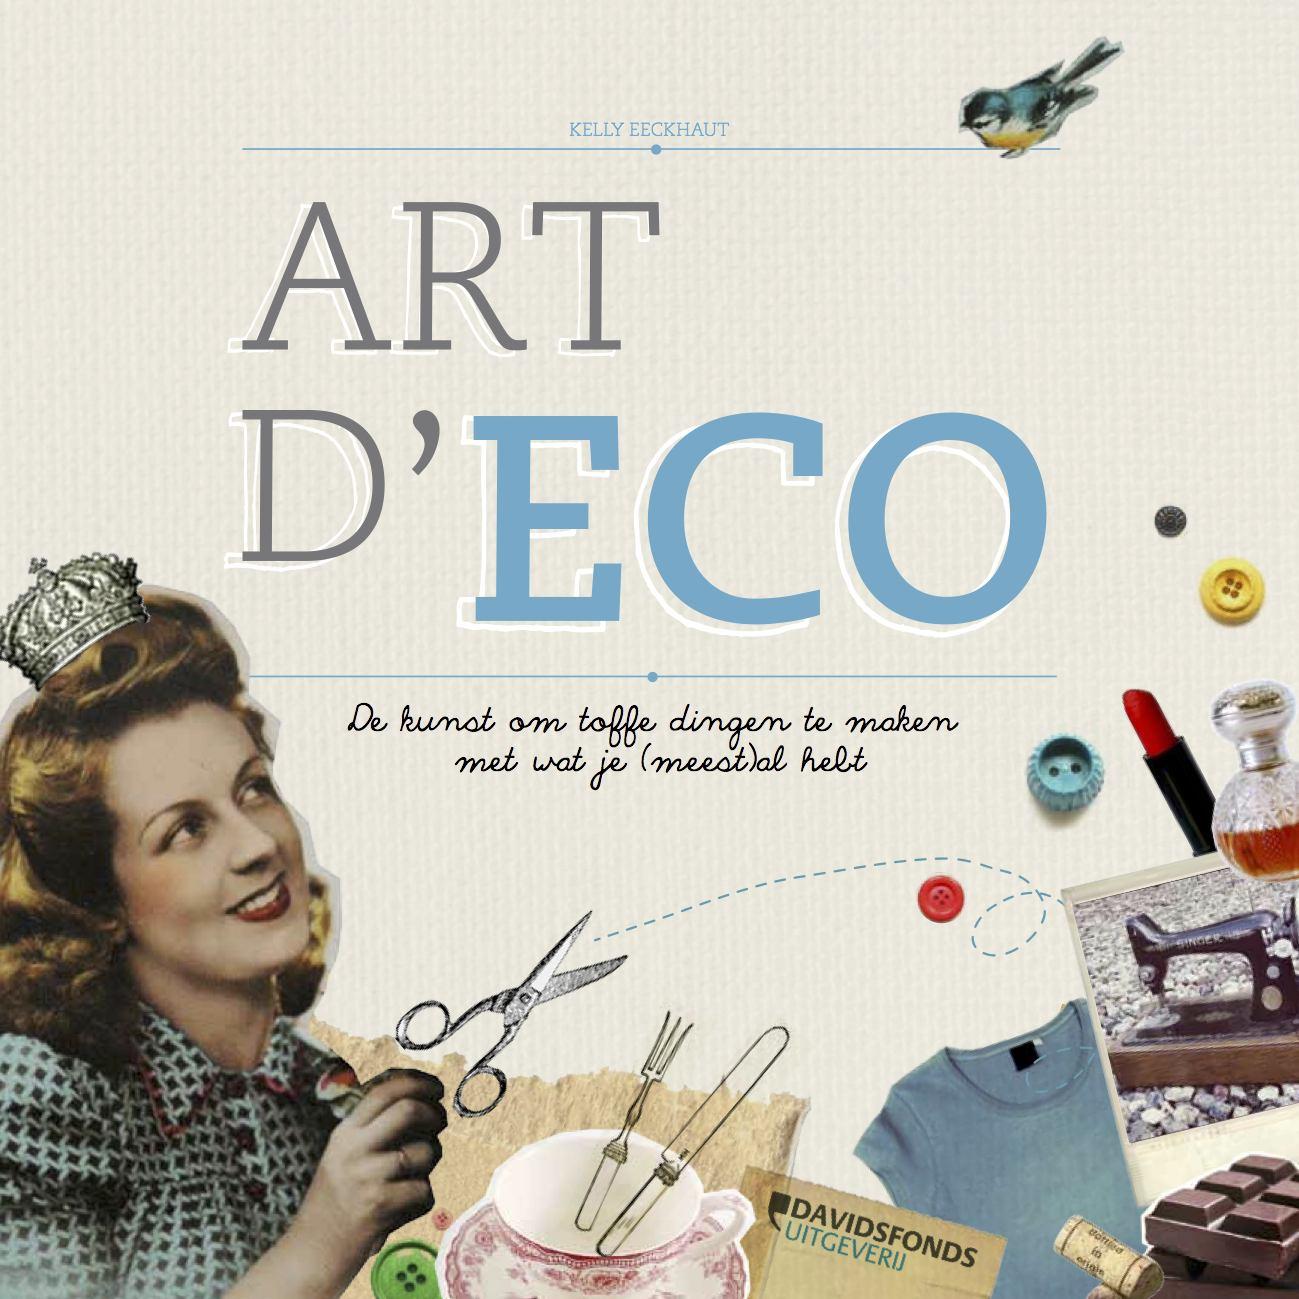 art-d-eco-cover-kelly-eeckhaut